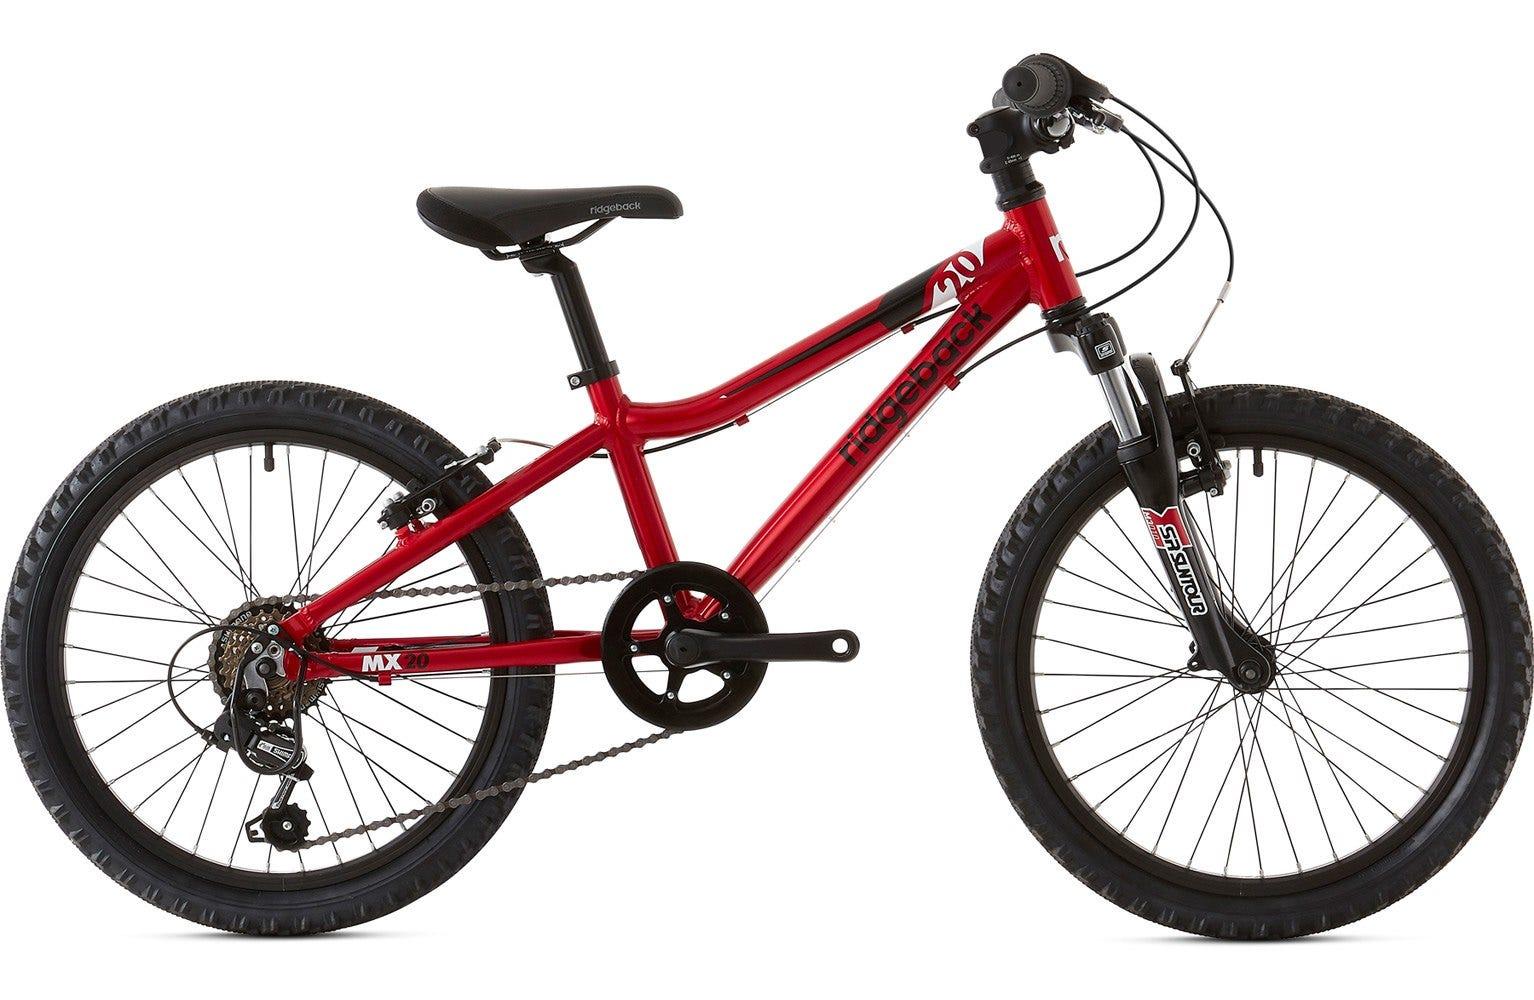 Ridgeback 2020 Mx20 20 Inch Wheel Red Ex Display Bike